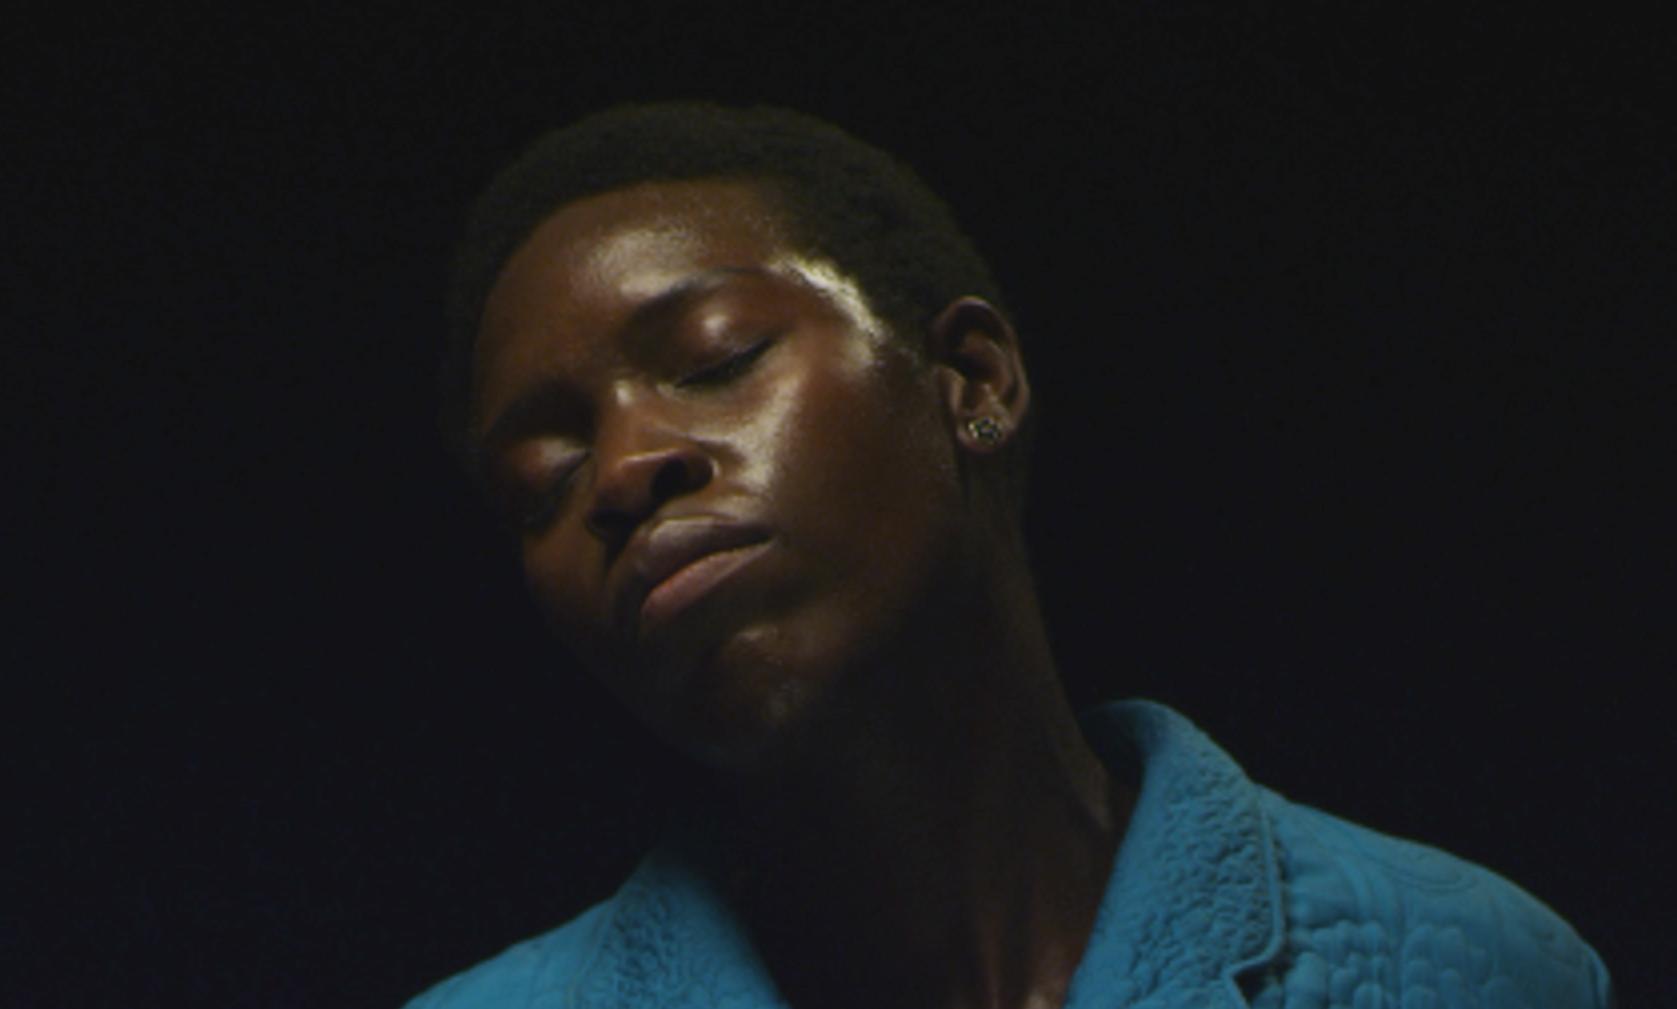 Kwes Bashful 2013 by Ian Pons Jewell